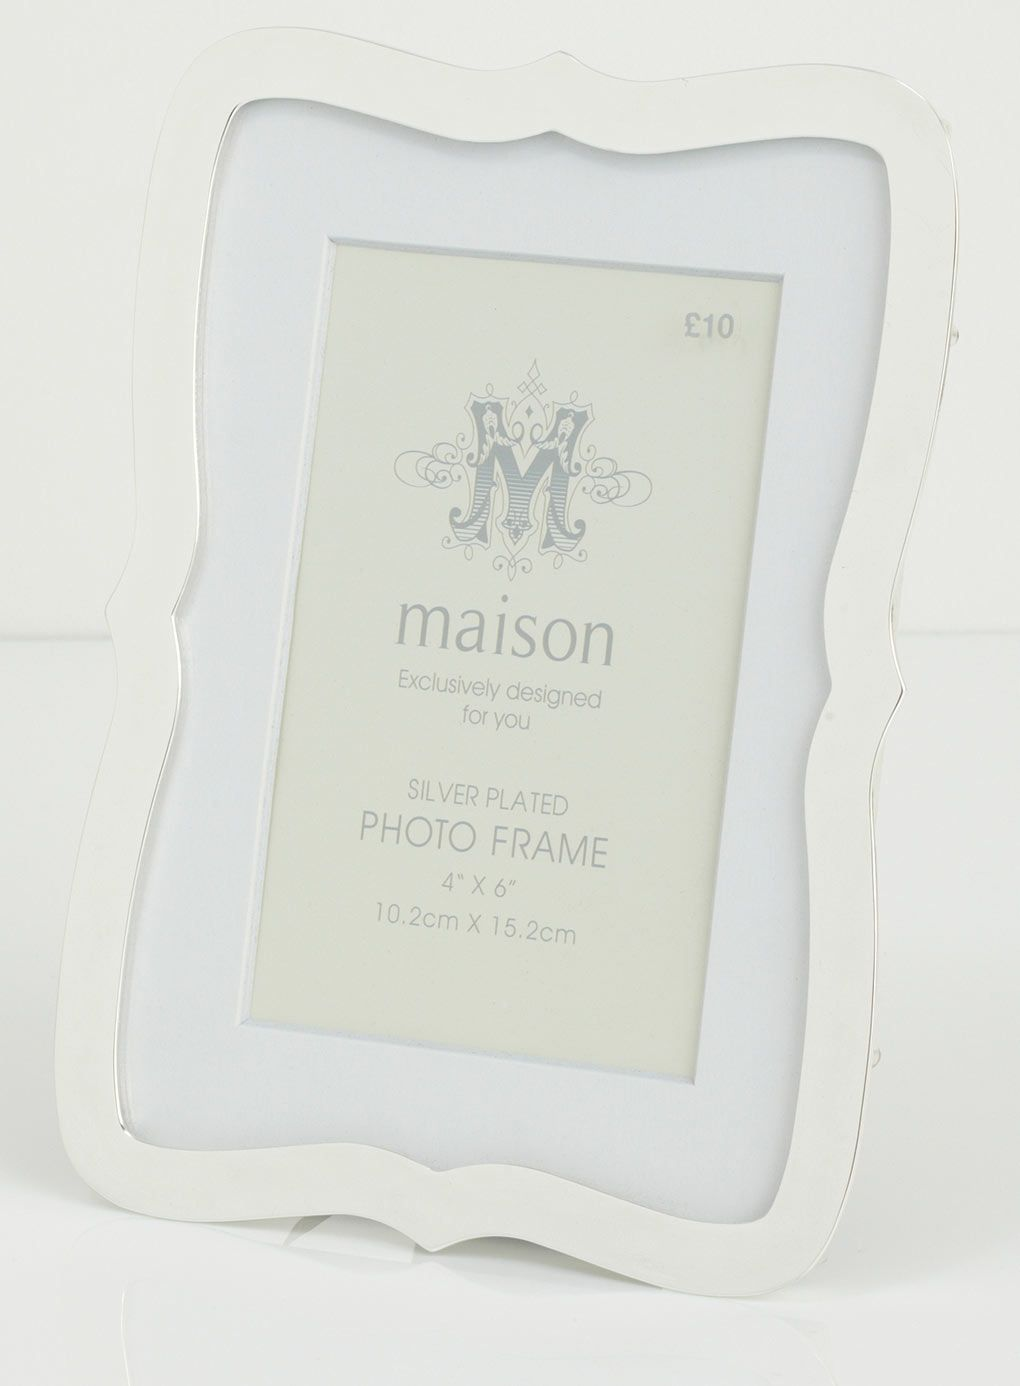 bhs picture frames | secondtofirst.com